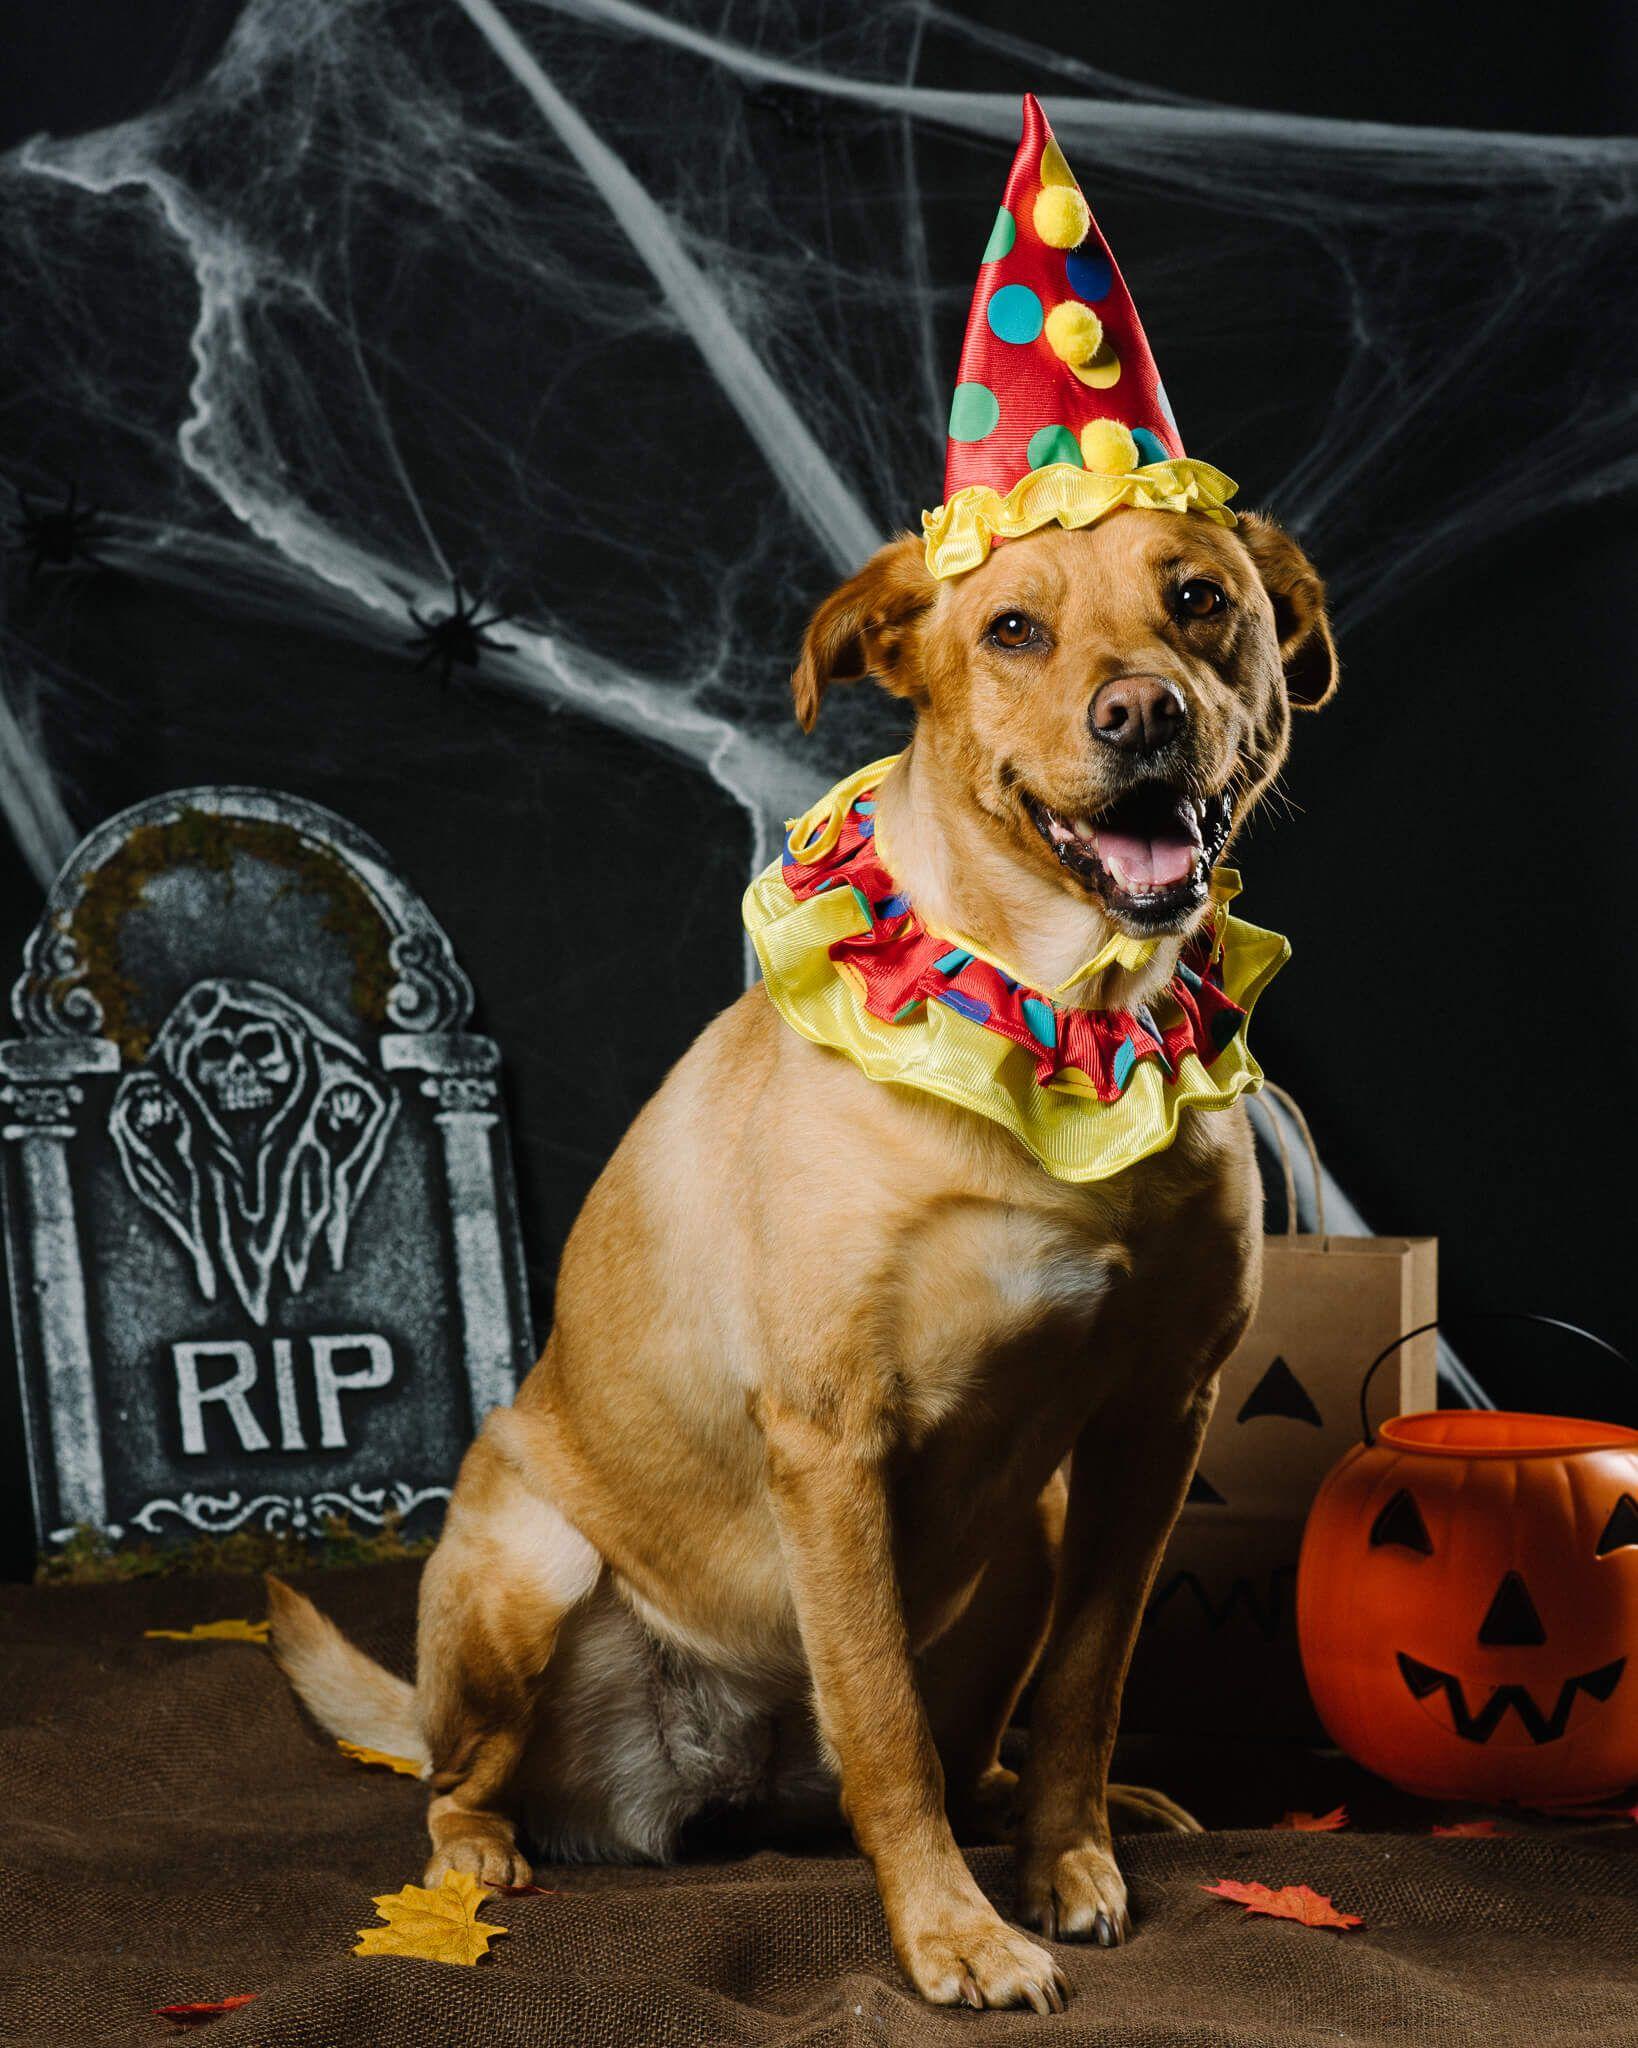 Happy HowlOWeen Top 10 Halloween Costumes DogVacay